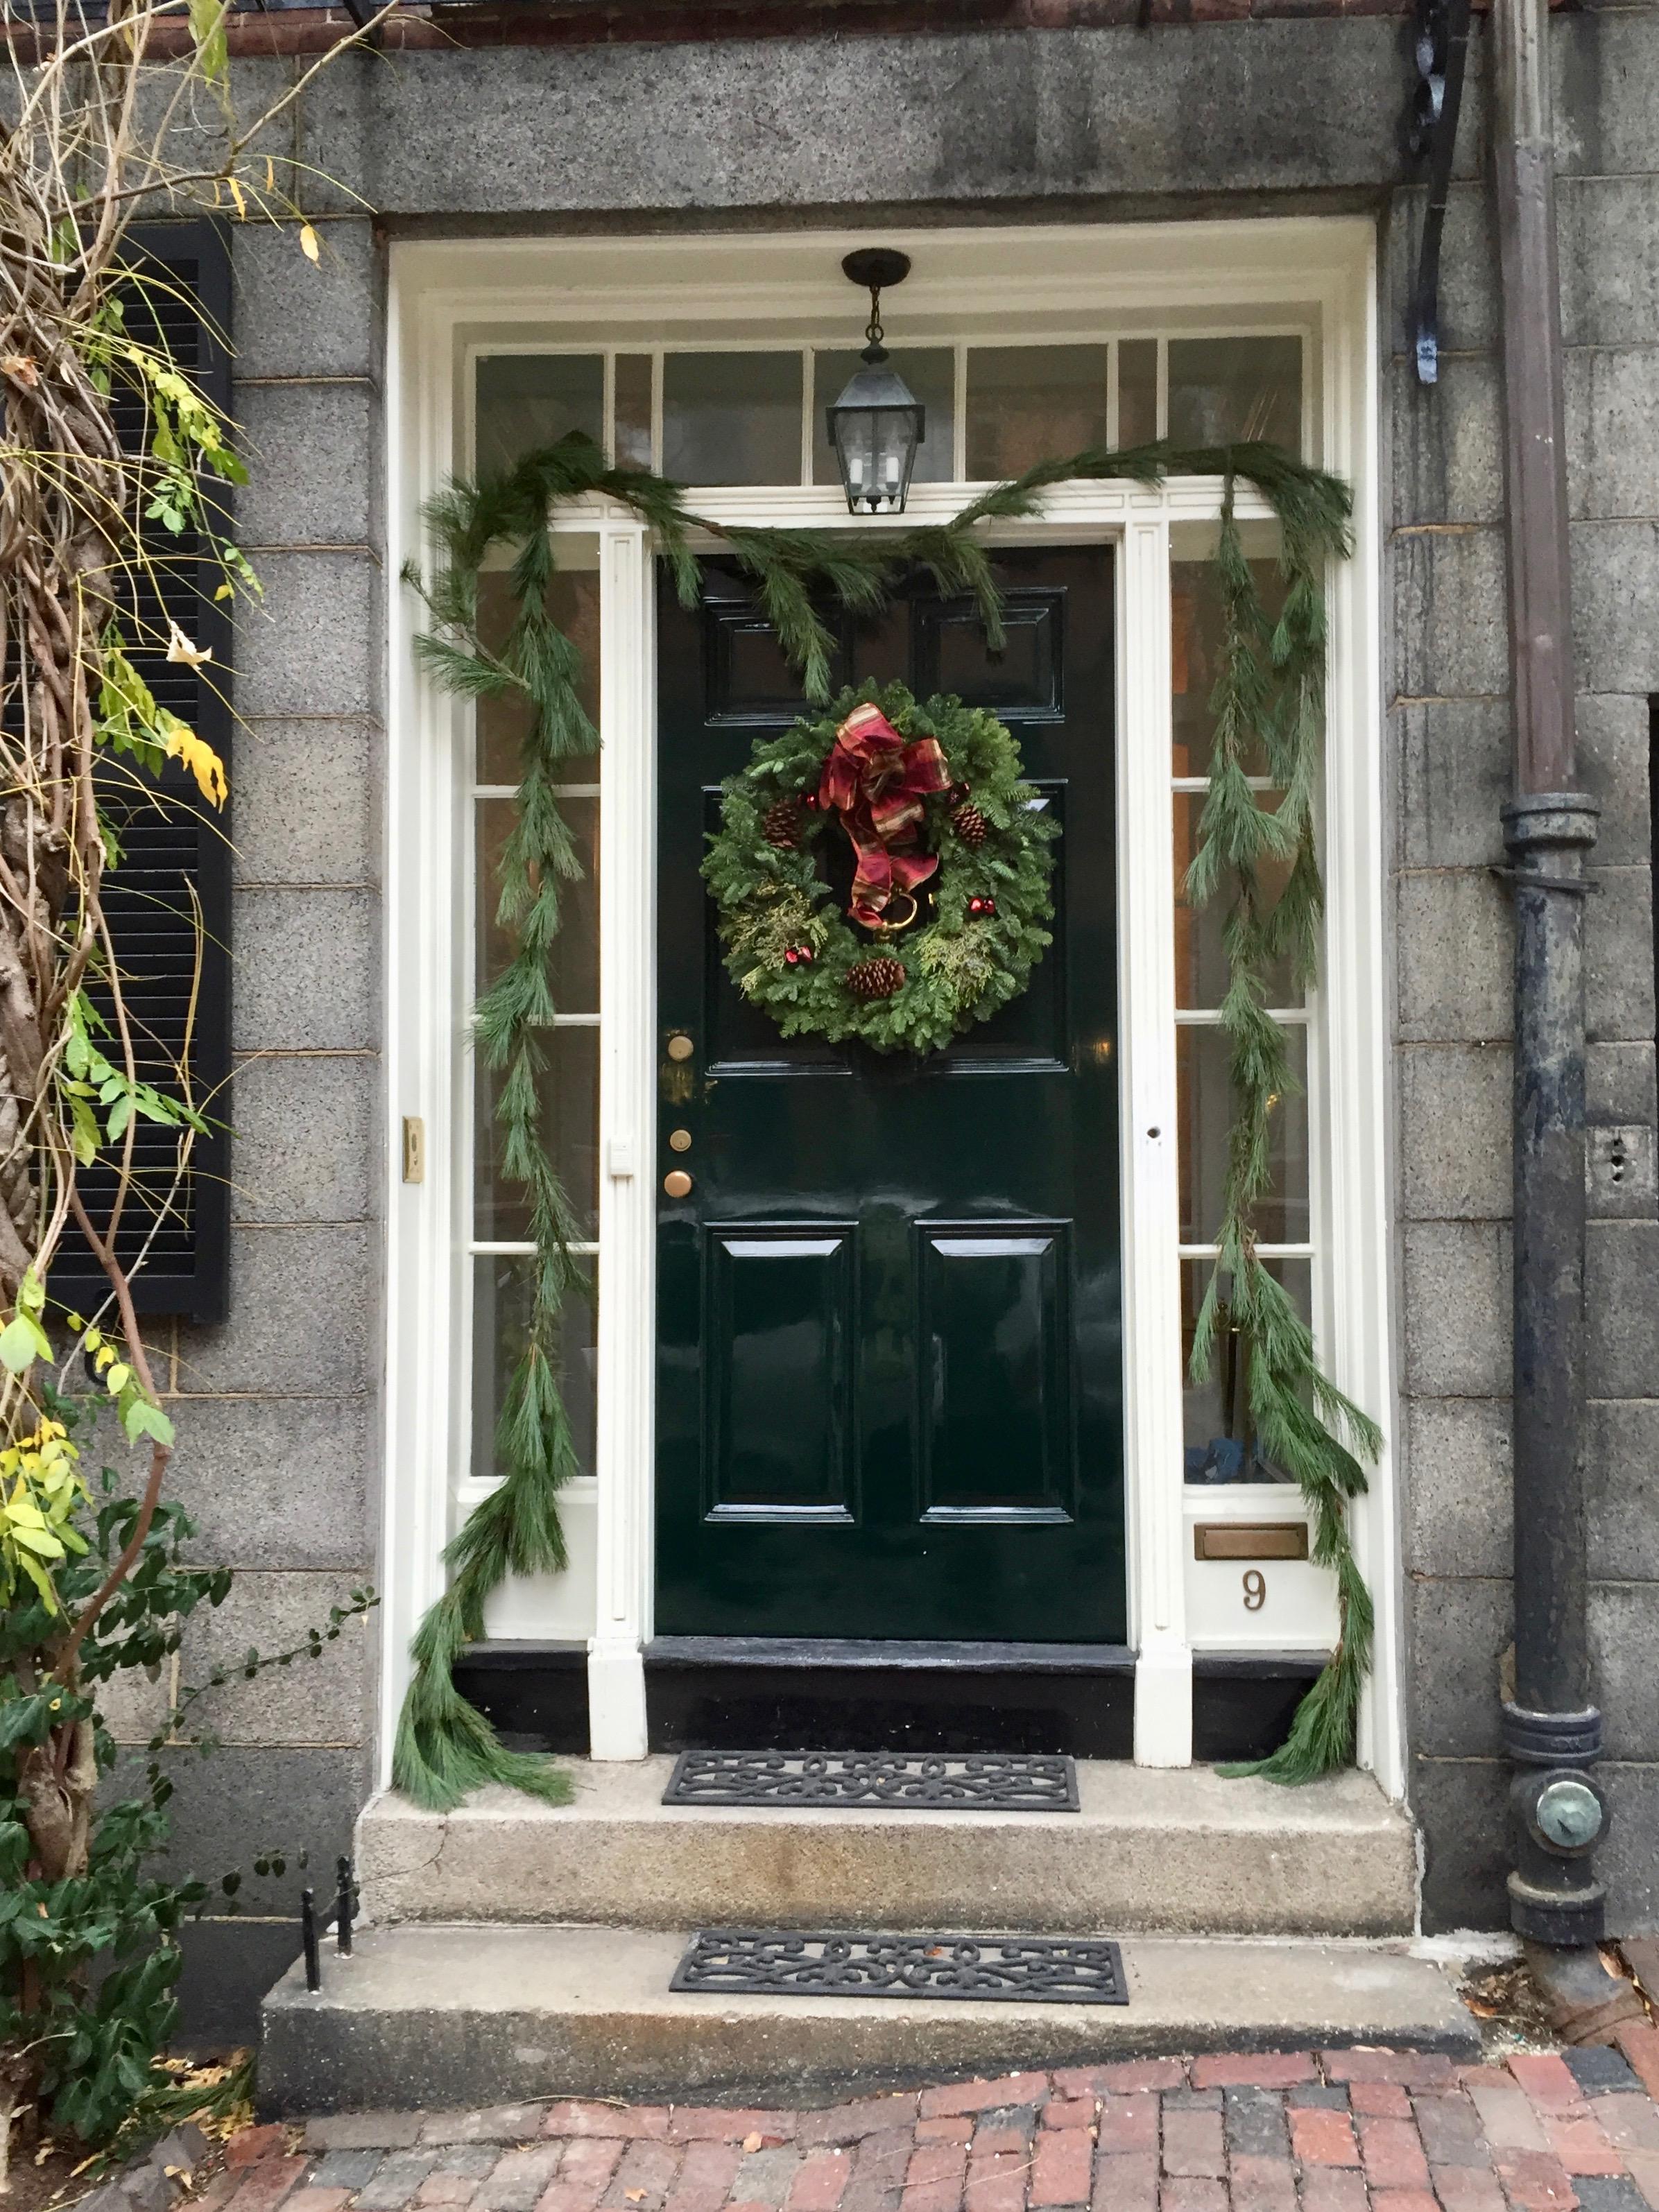 Stone house on Beacon Hill Christmas in Boston.jpg